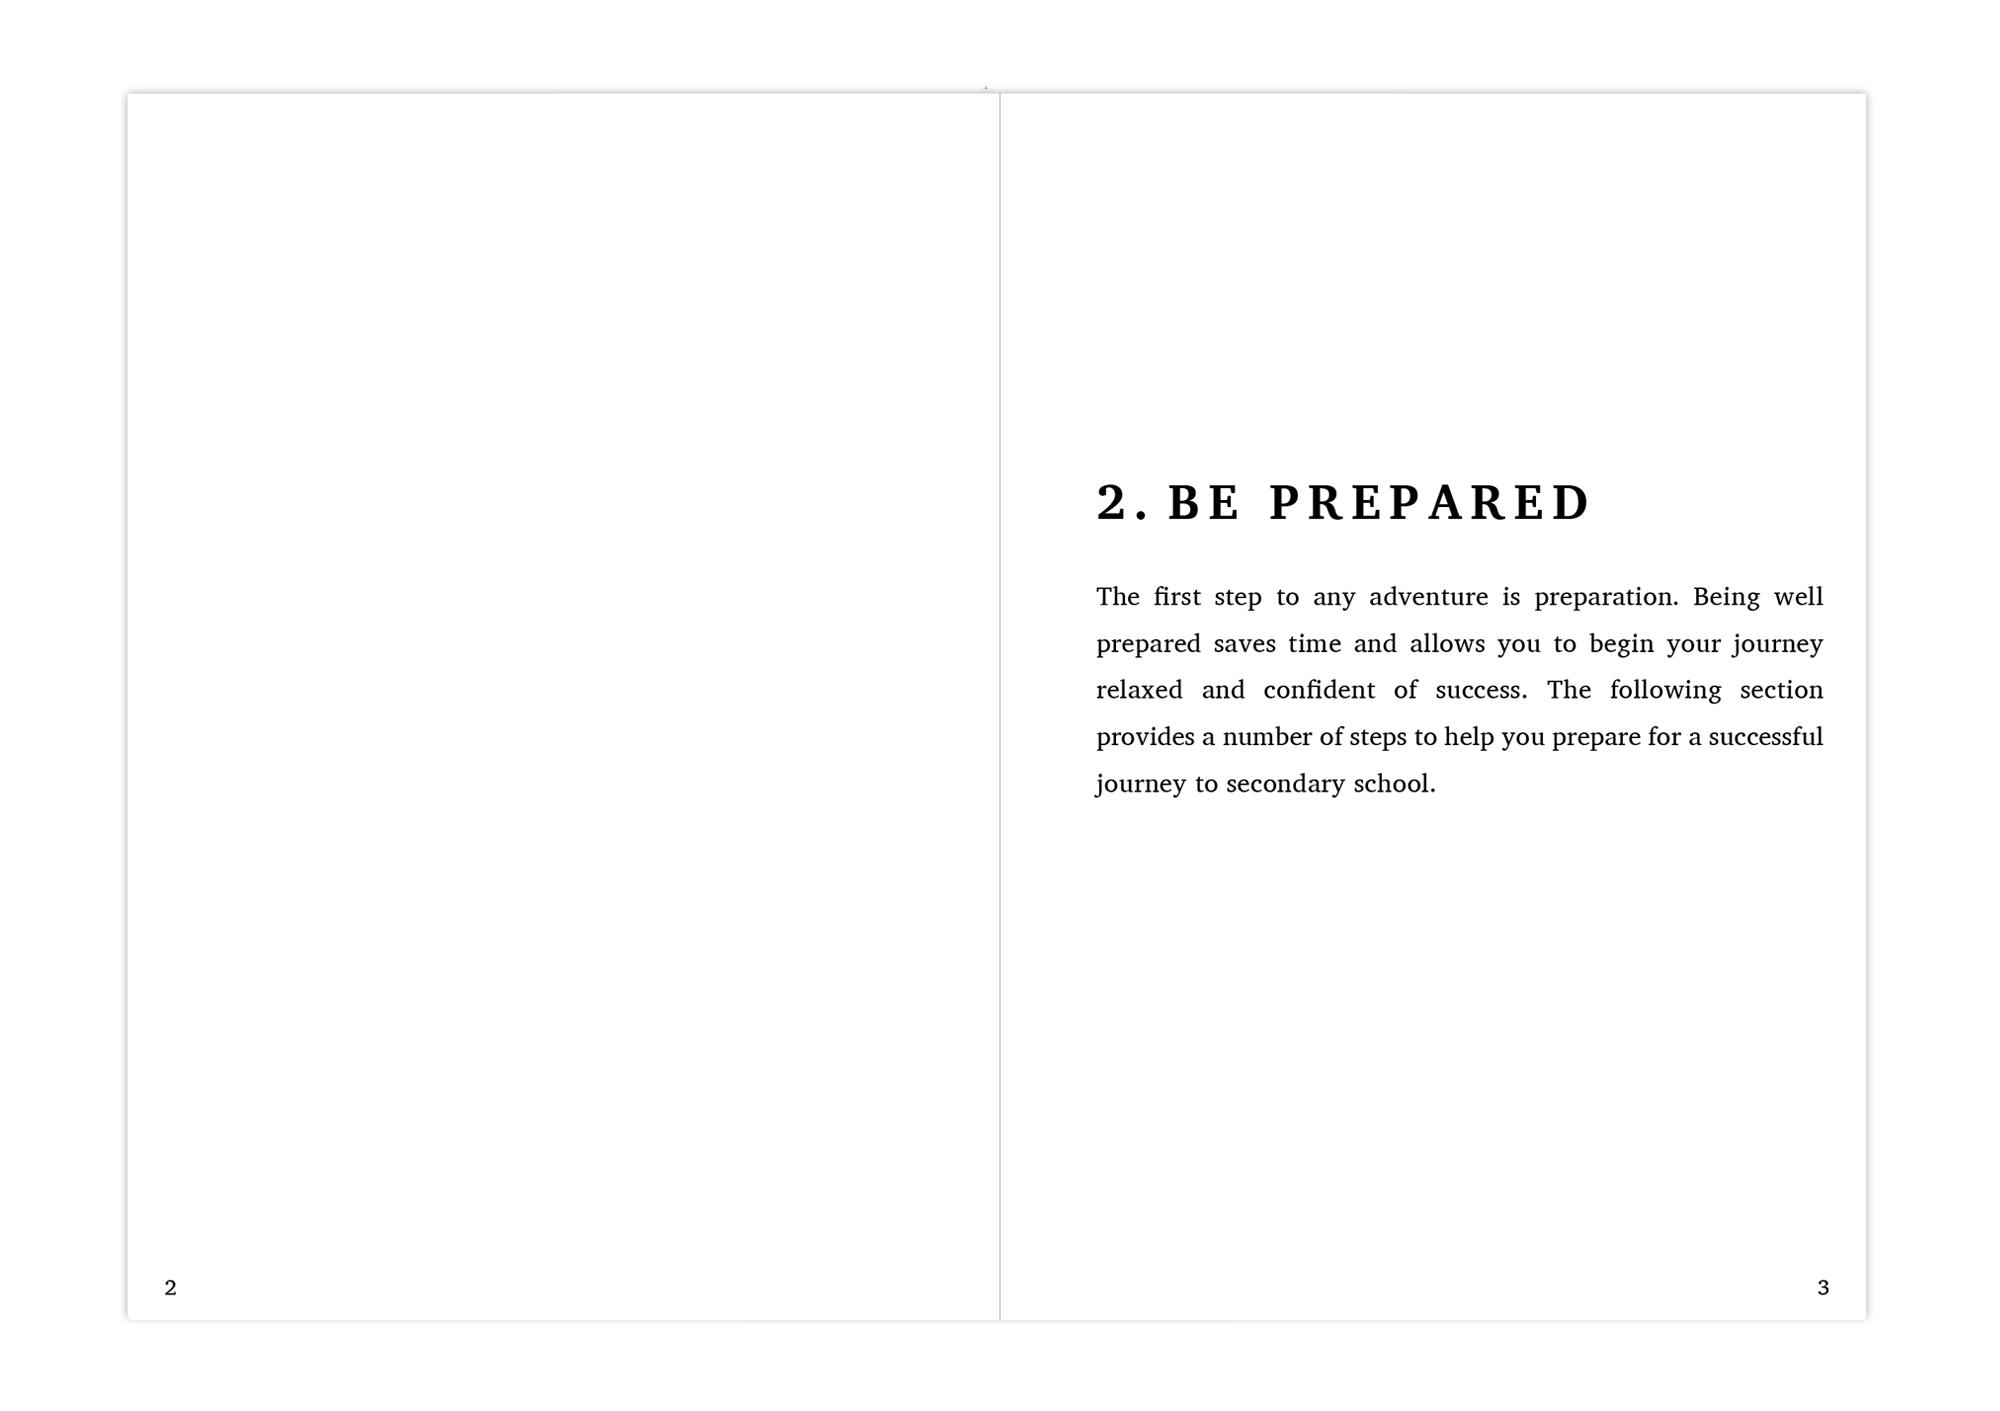 SG-Spead-prepared.jpg